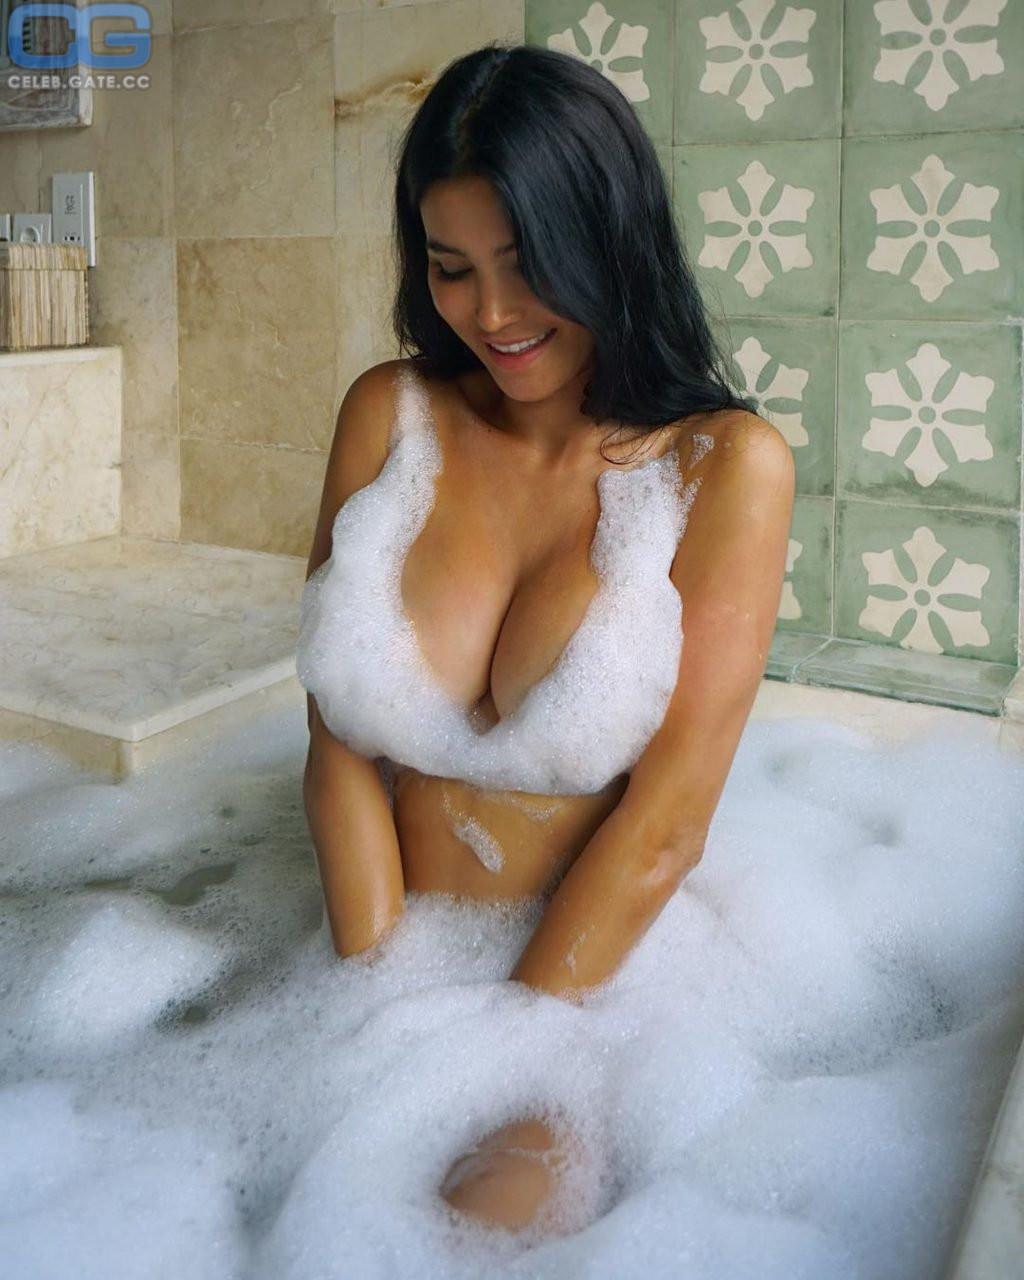 Nackt svetlana bilyalova Svetlana Bilyalova: